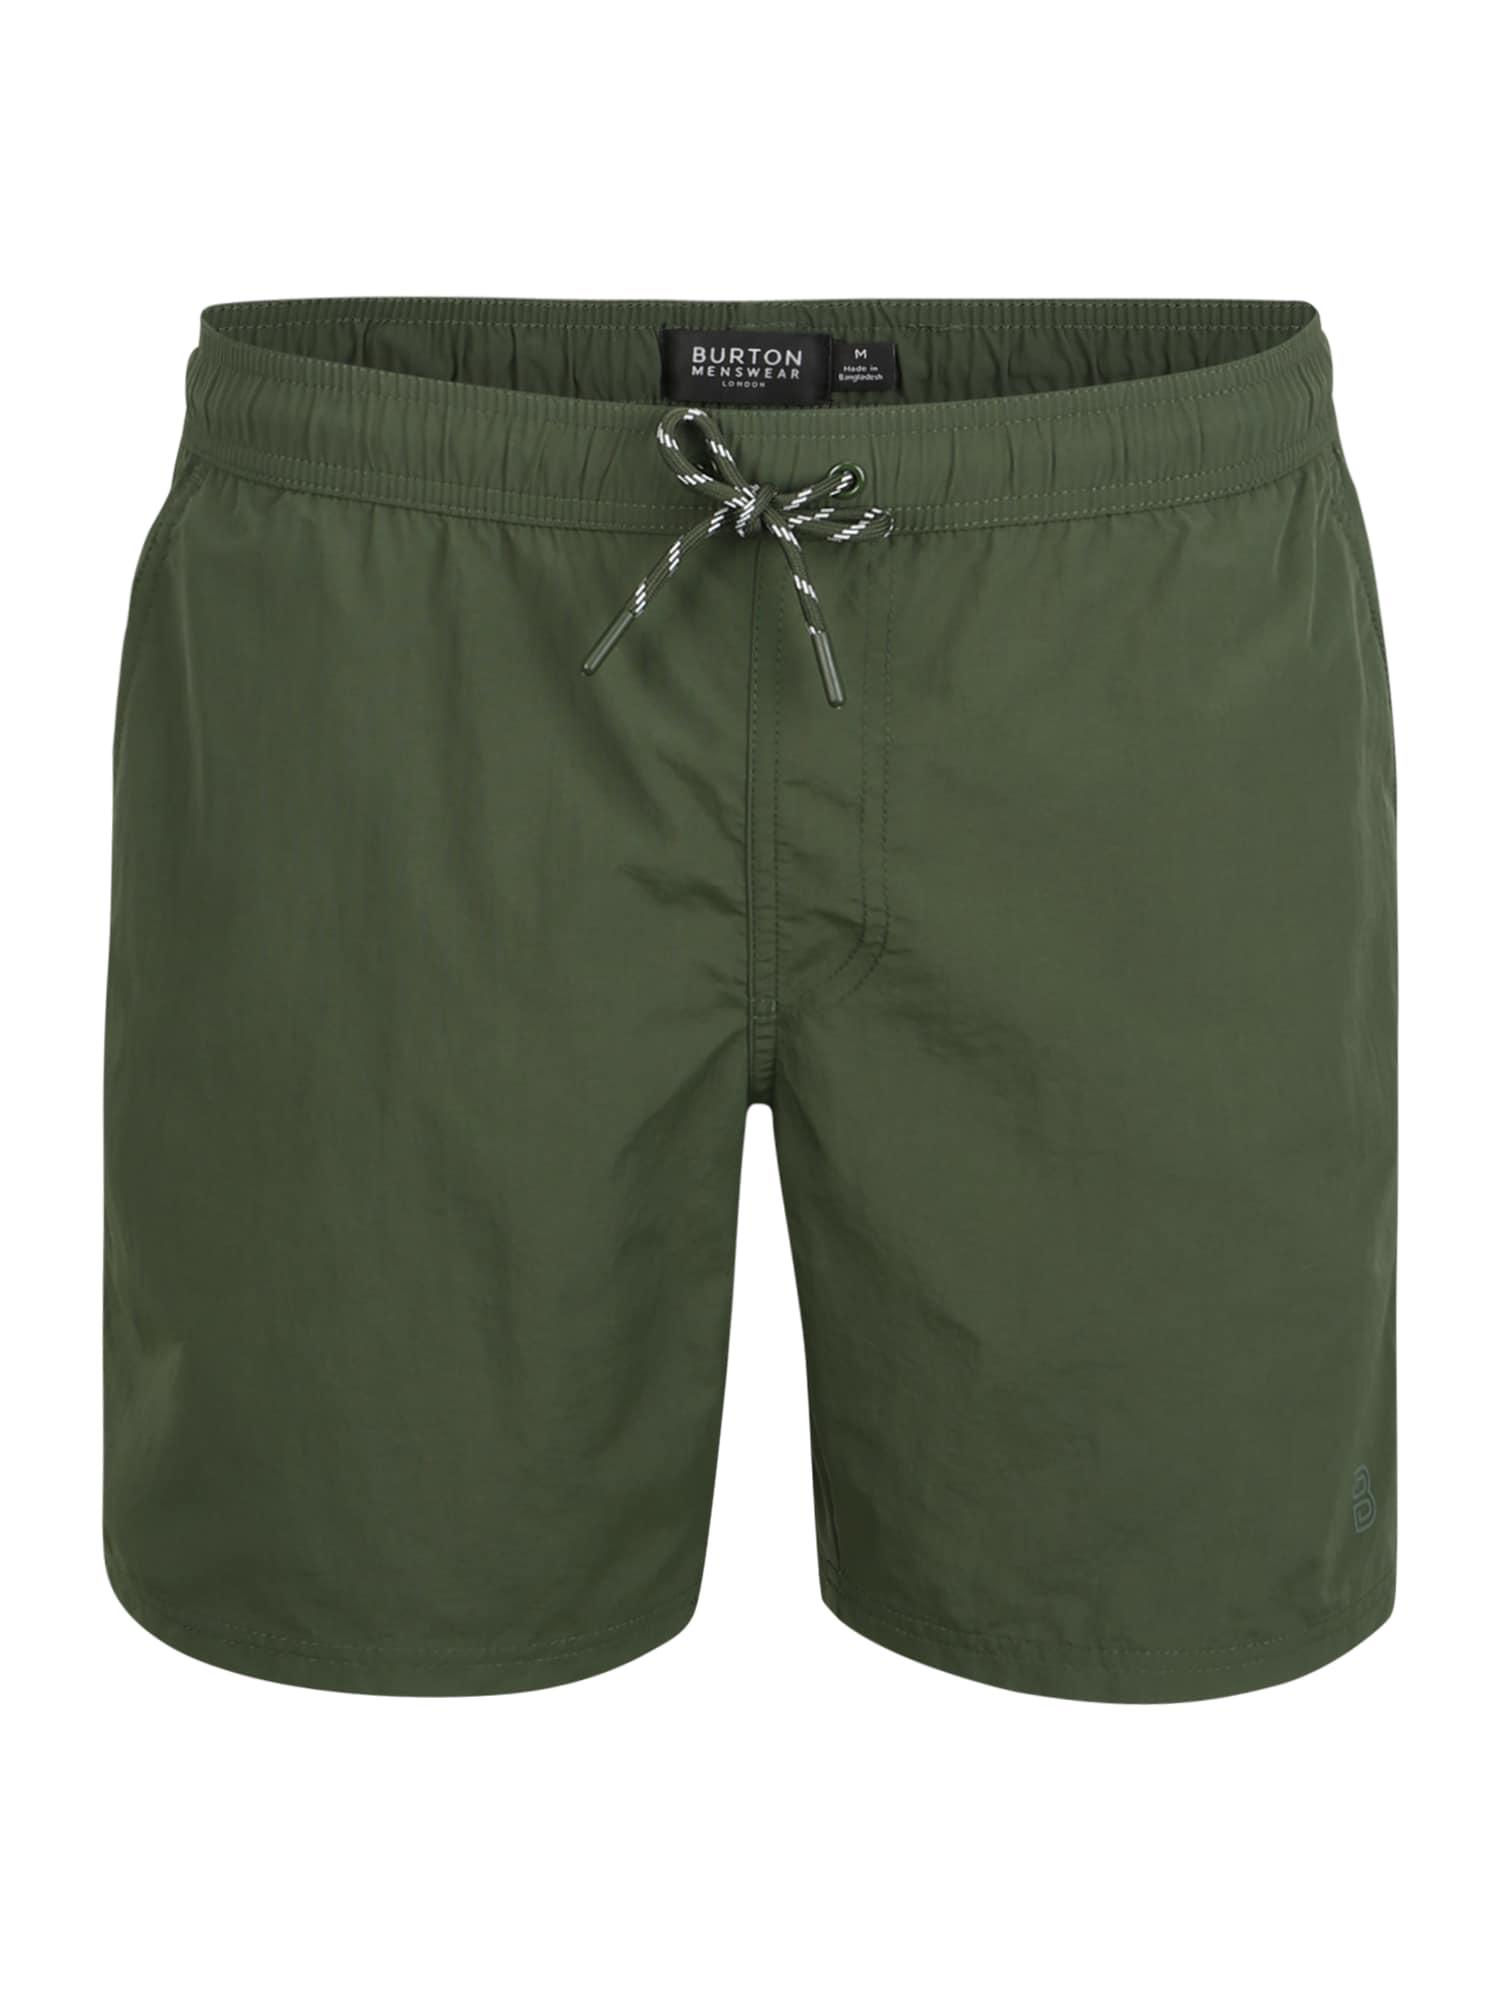 Badeshorts 'CORE CROC GREEN SWIM' | Bekleidung > Bademode > Badeshorts | BURTON MENSWEAR LONDON